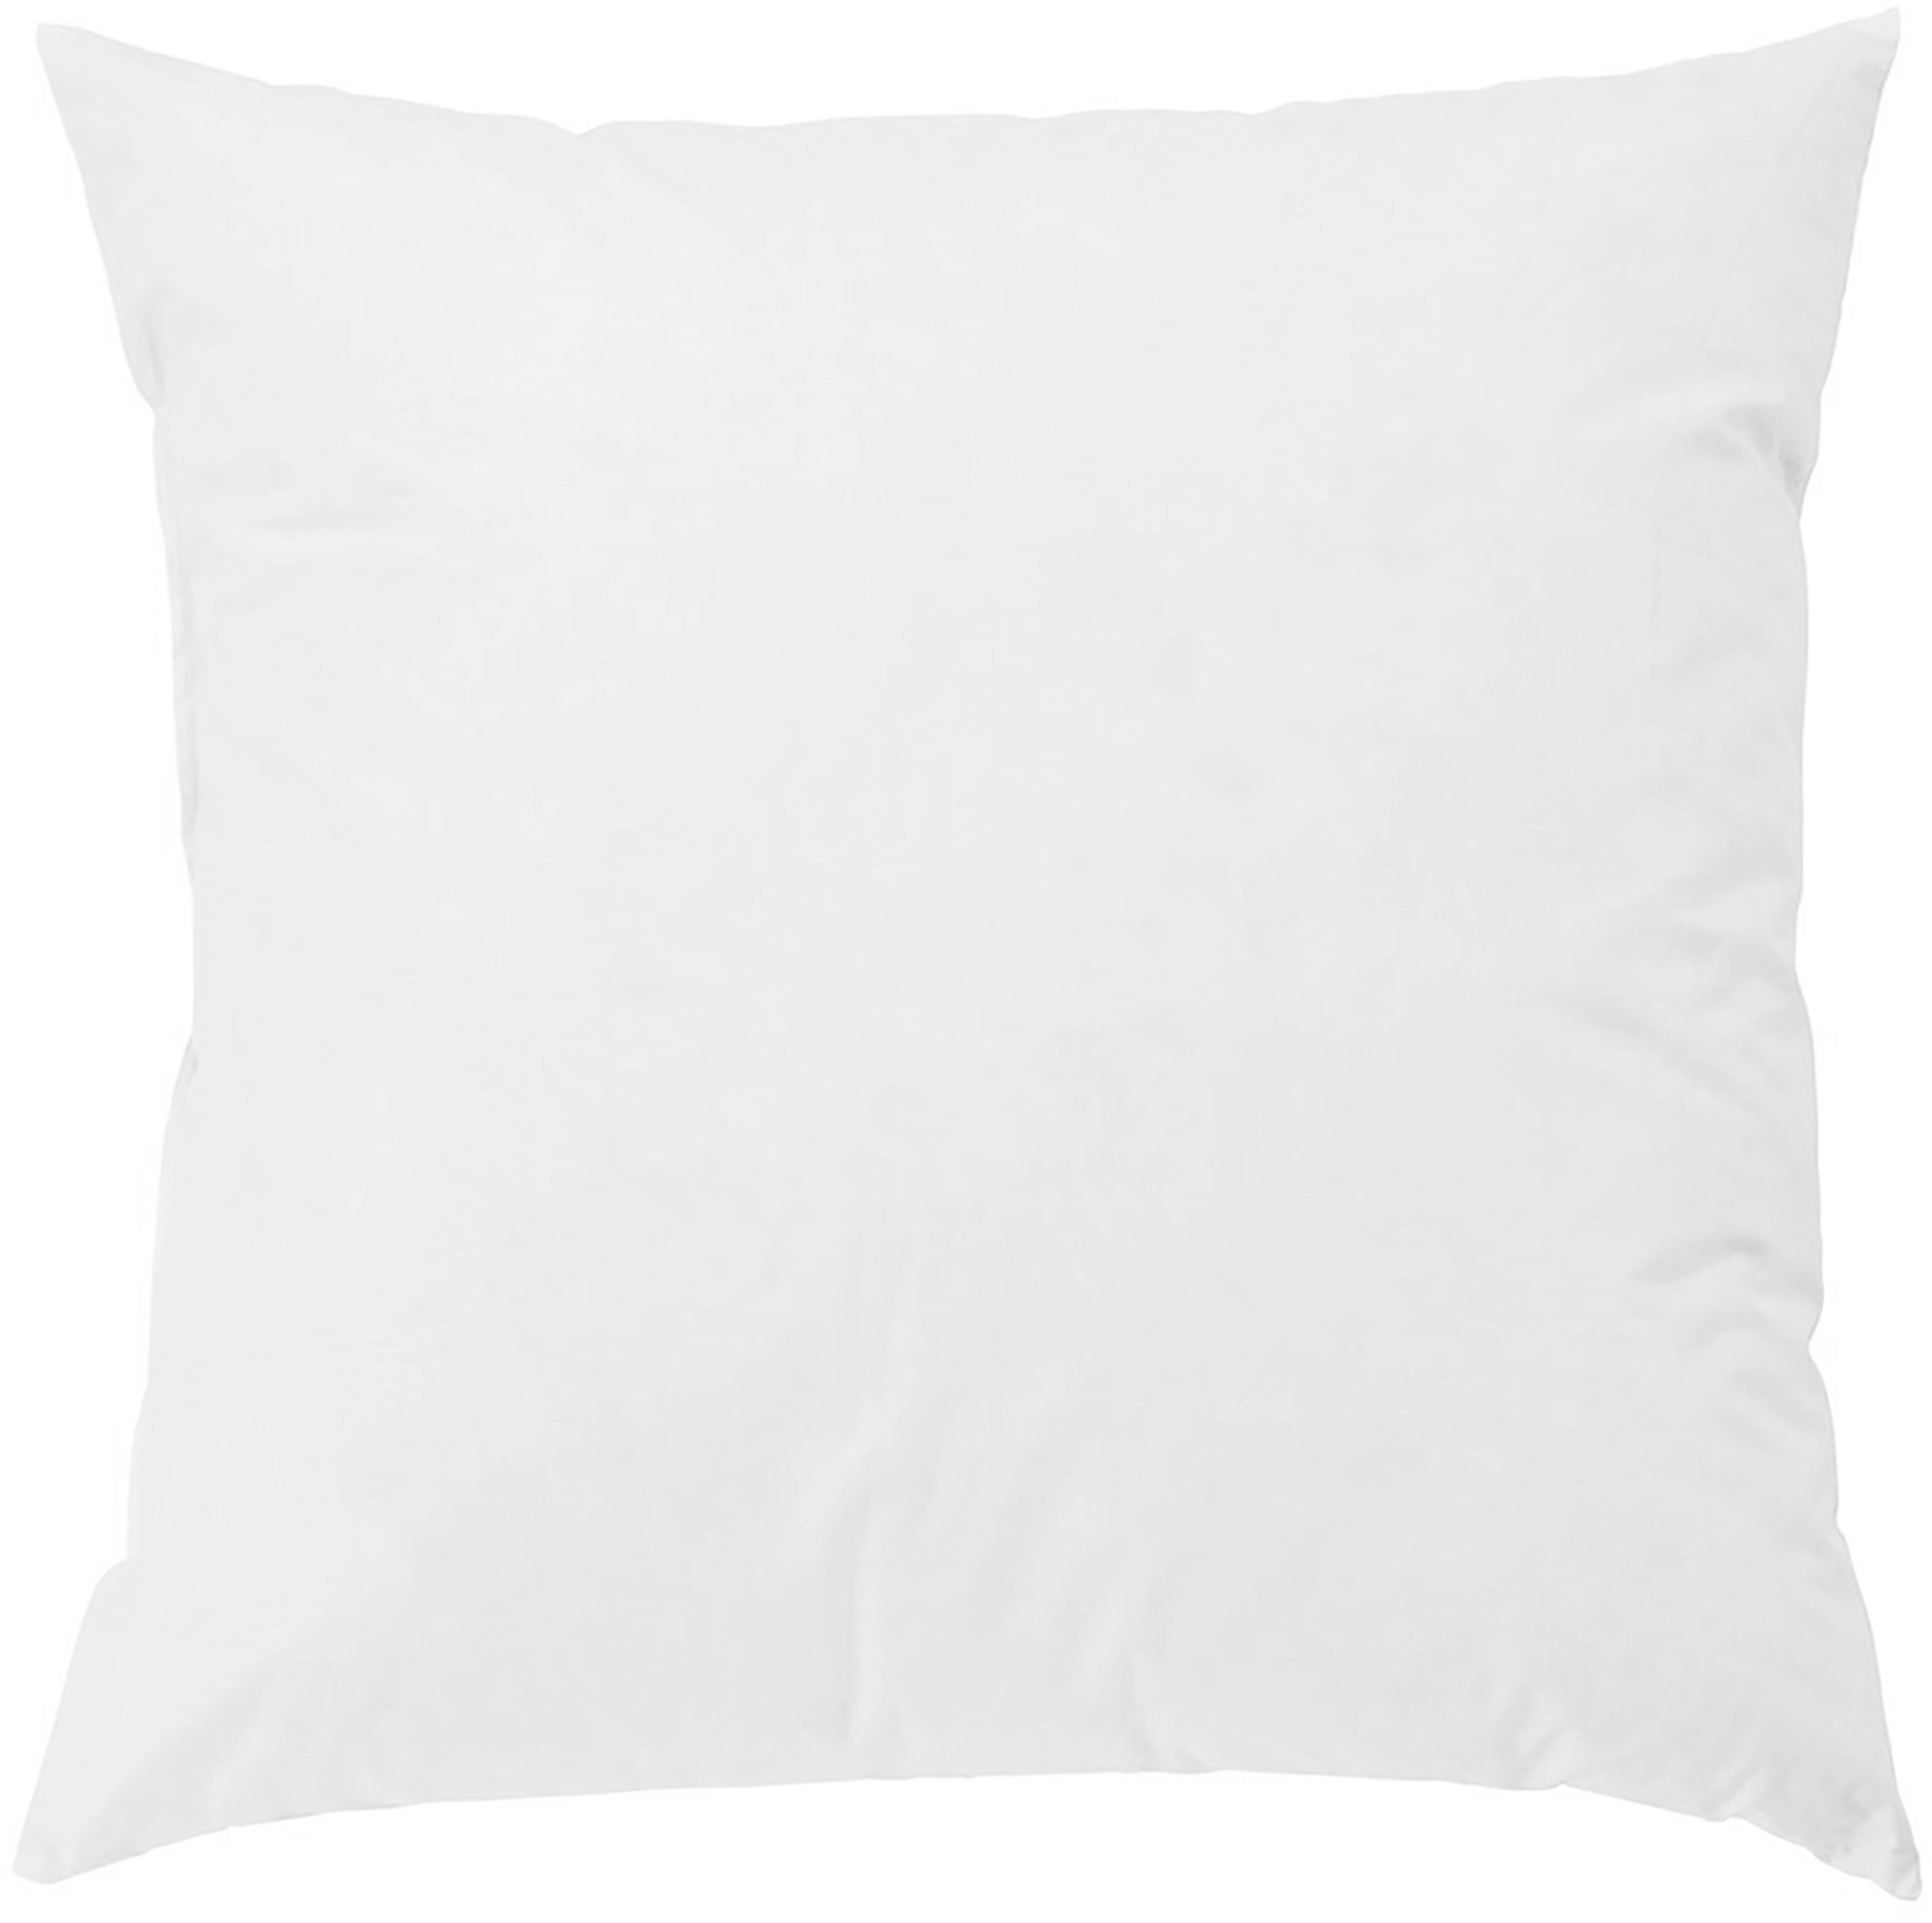 Relleno de cojín Premium, 45x45, Funda: percal Mako, 100%algodón, Blanco, An 45 x L 45 cm